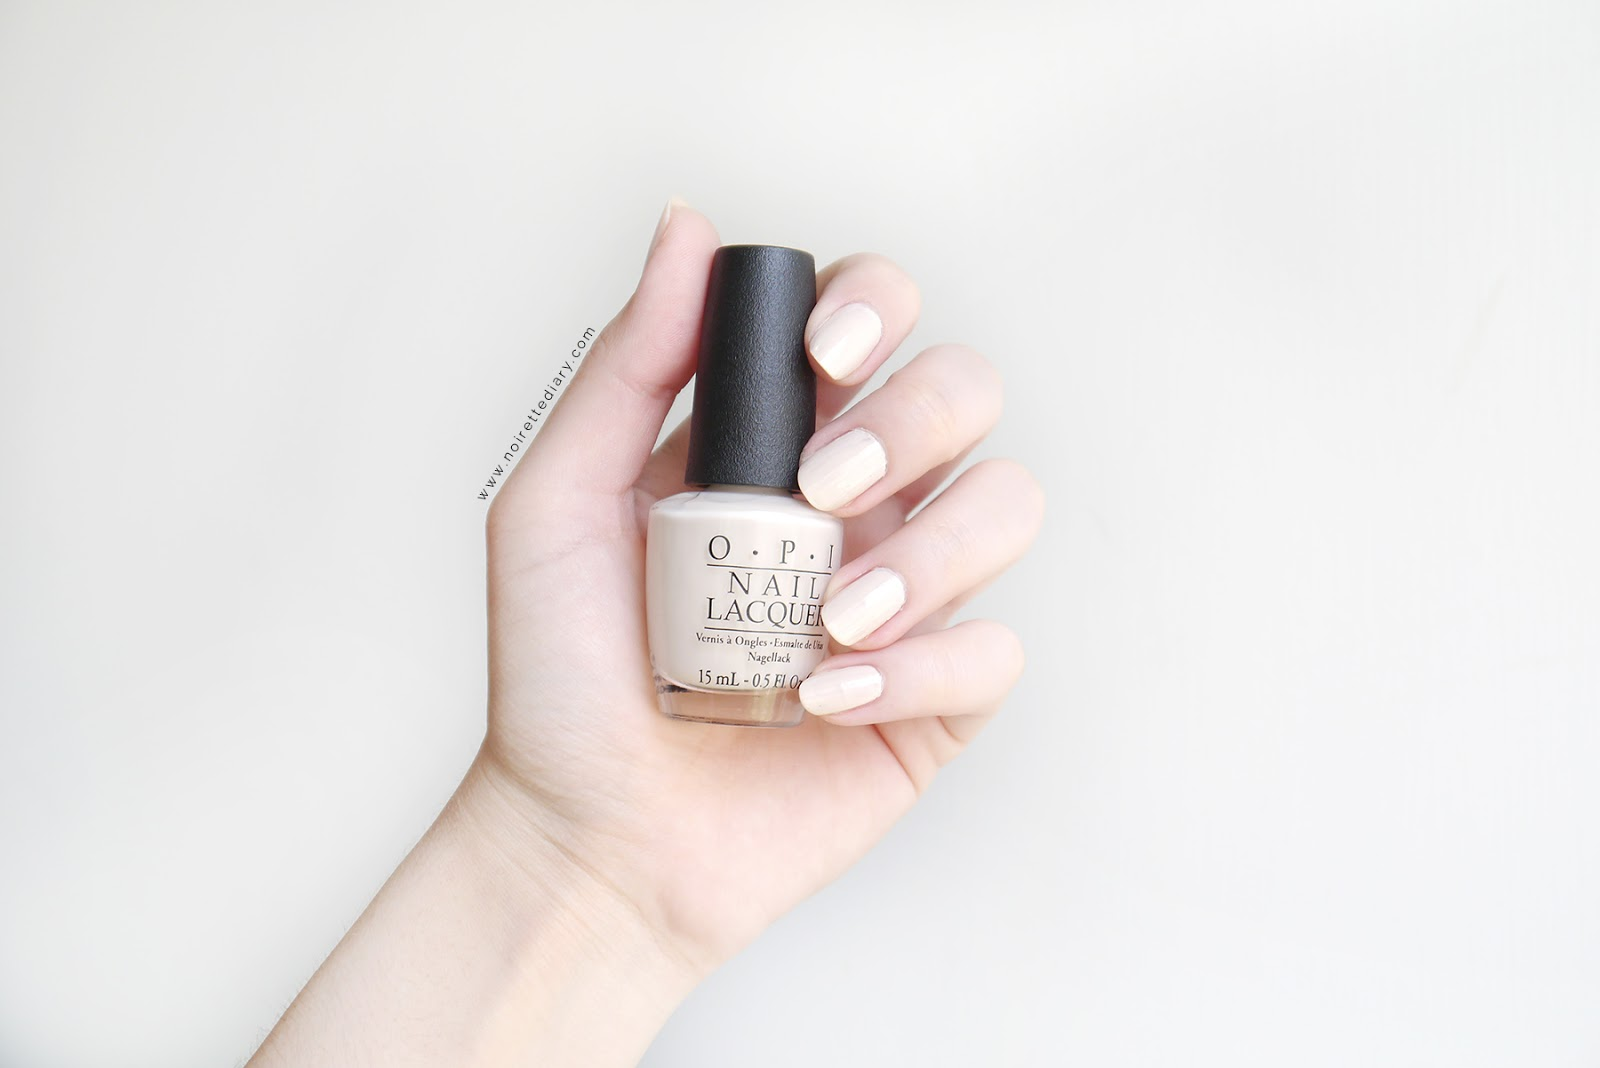 Nude Nails + New Shape